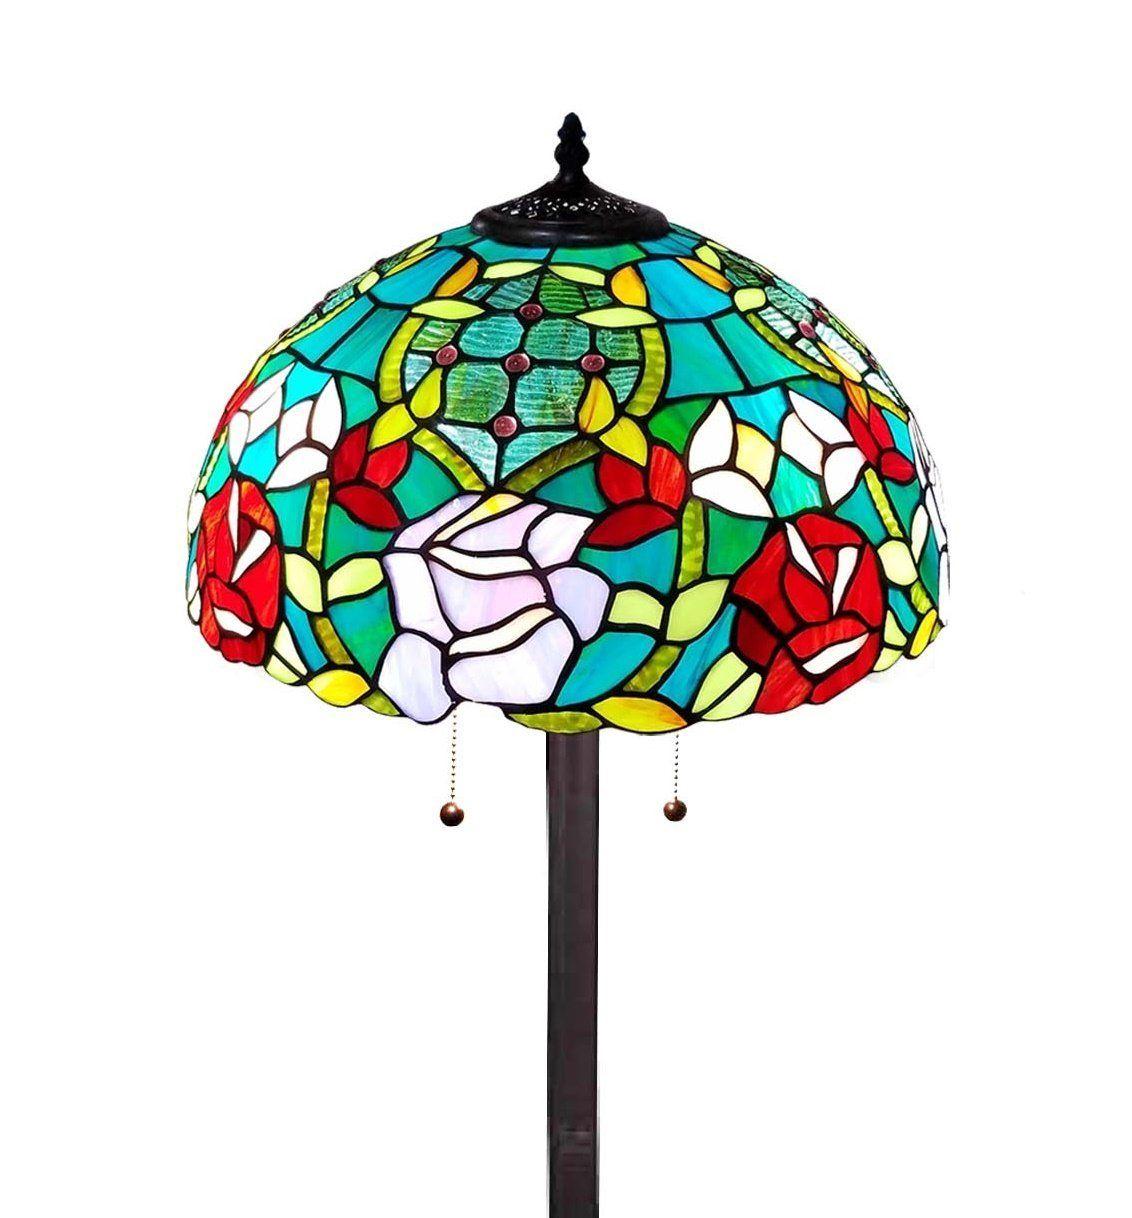 Amora Lighting Am084fl16 Tiffany Style Roses Floor Lamp 61 In Amazon Com Rose Floor Lamp Glass Floor Lamp Floor Lamp